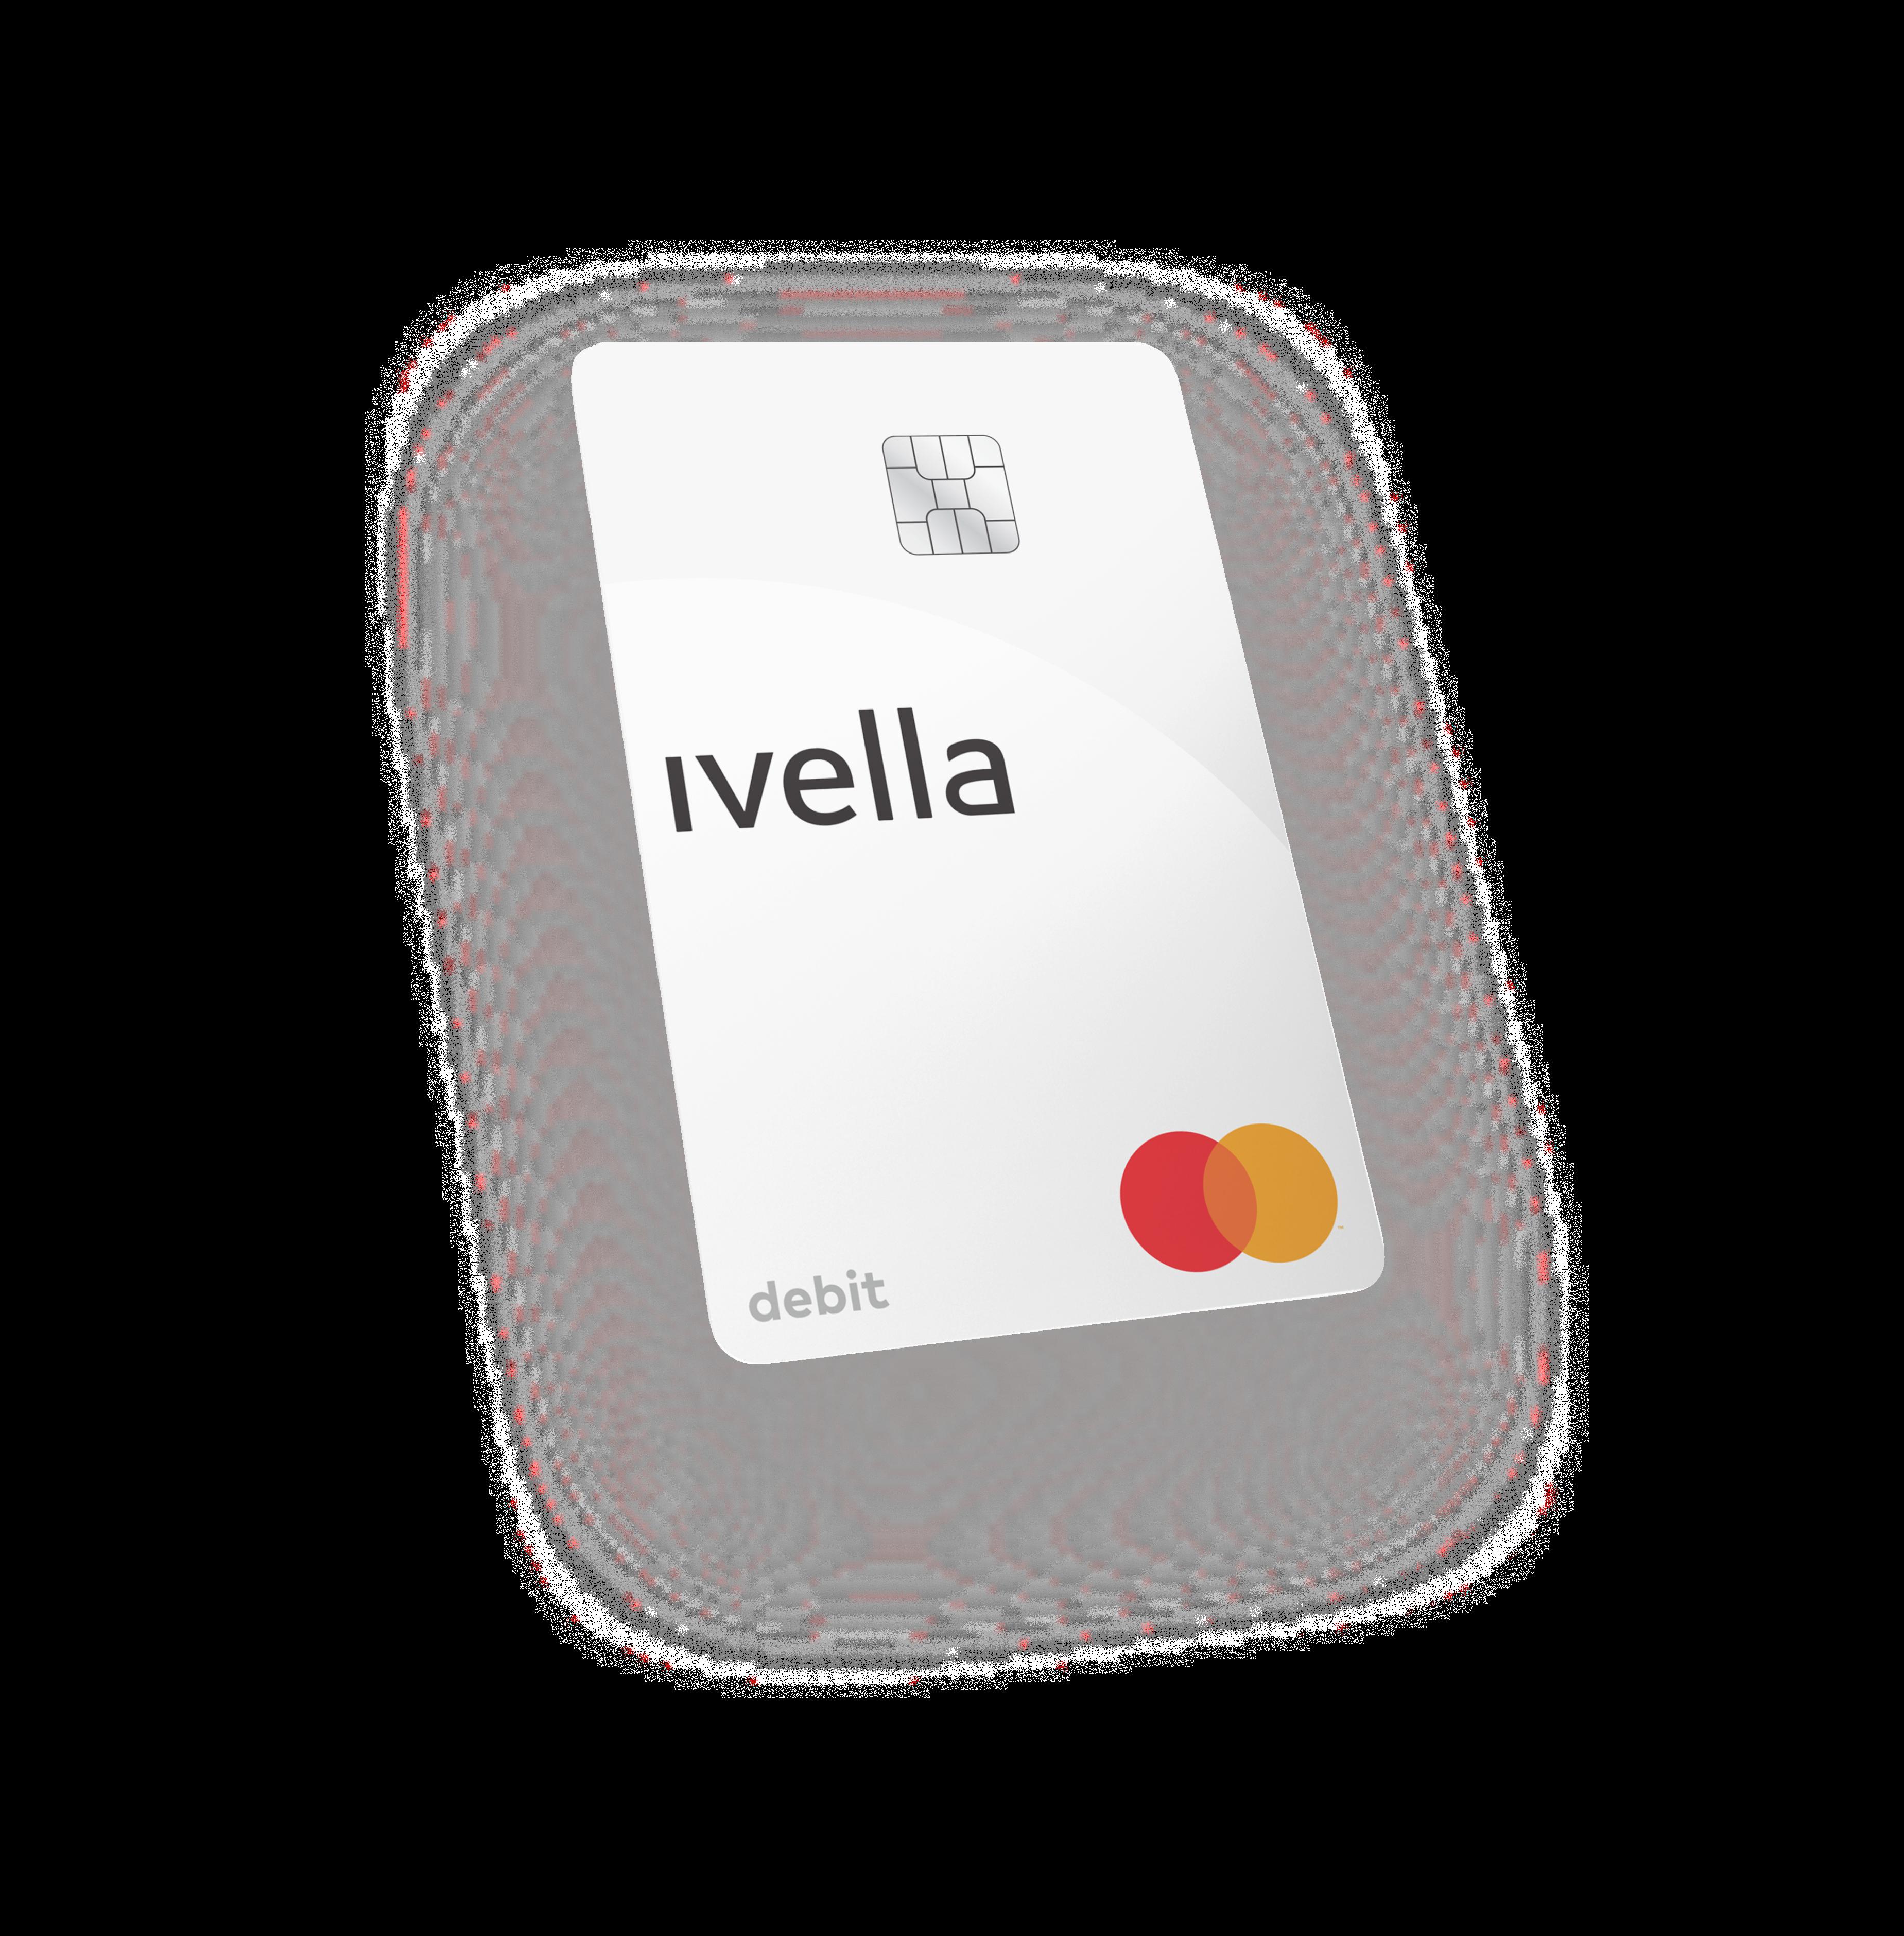 Ivella Mastercard Debit Card 3D mockup